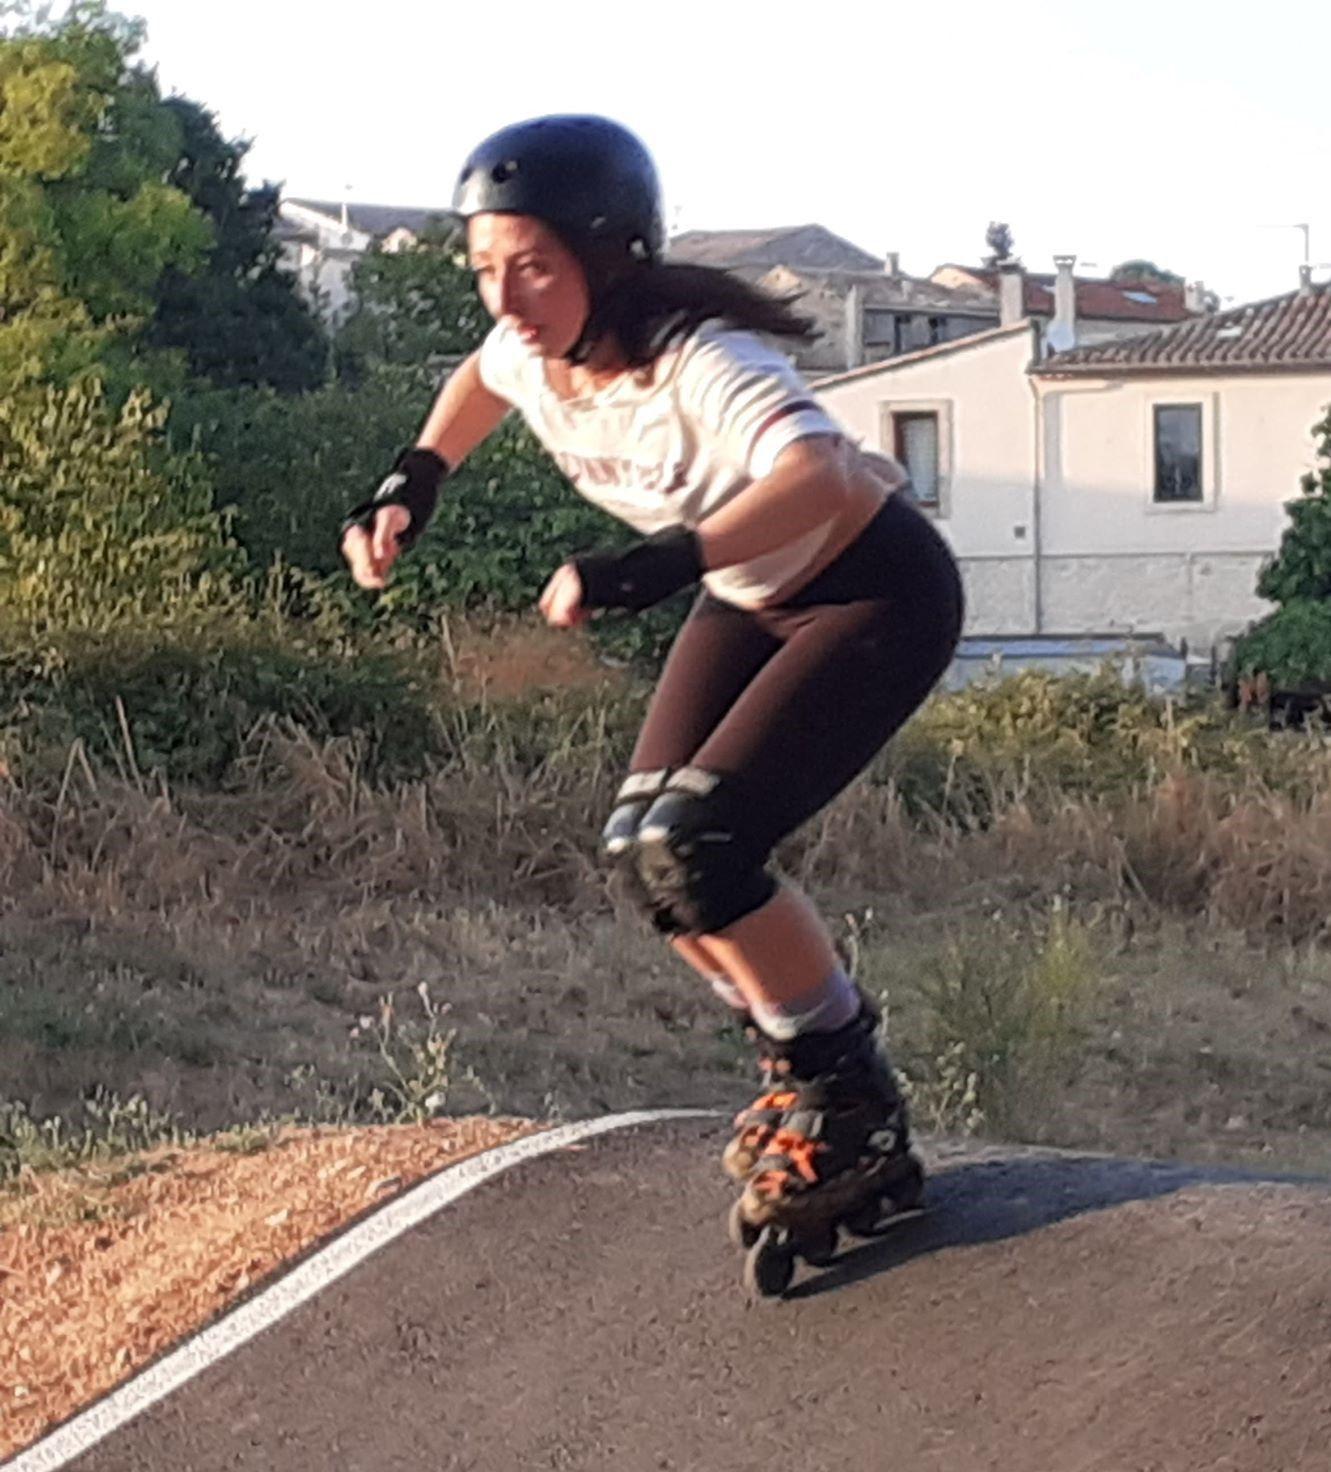 Rolletr Lib, cours, sport, enfant, adulte, famille, patin, essai, roller, Nîmes, Gard